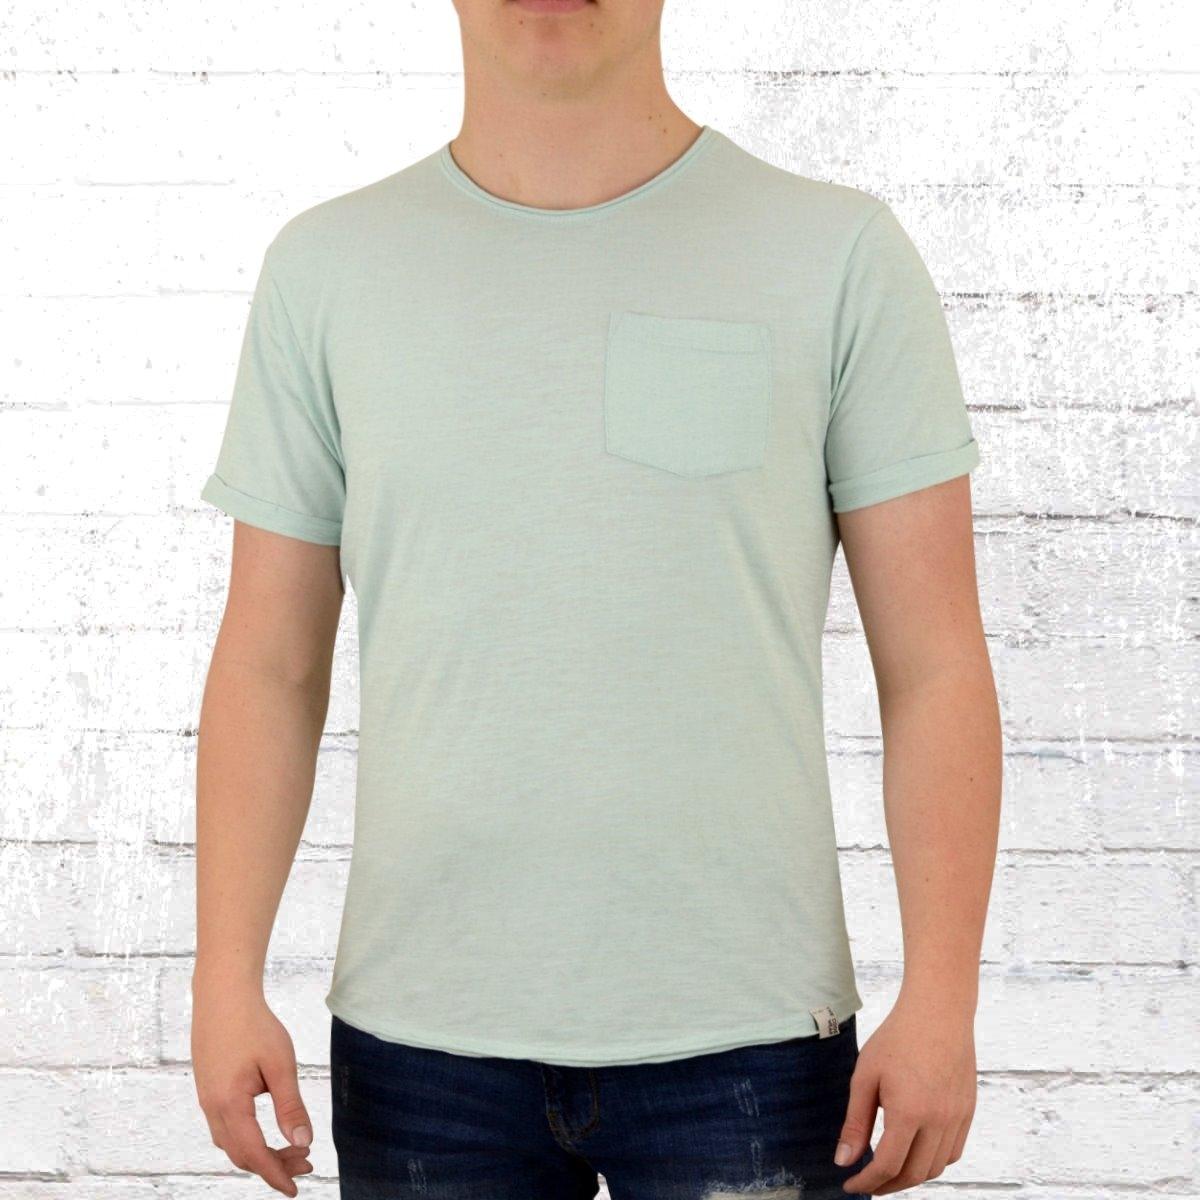 Indicode Herren T-Shirt Mit Brusttasche Overland türkis